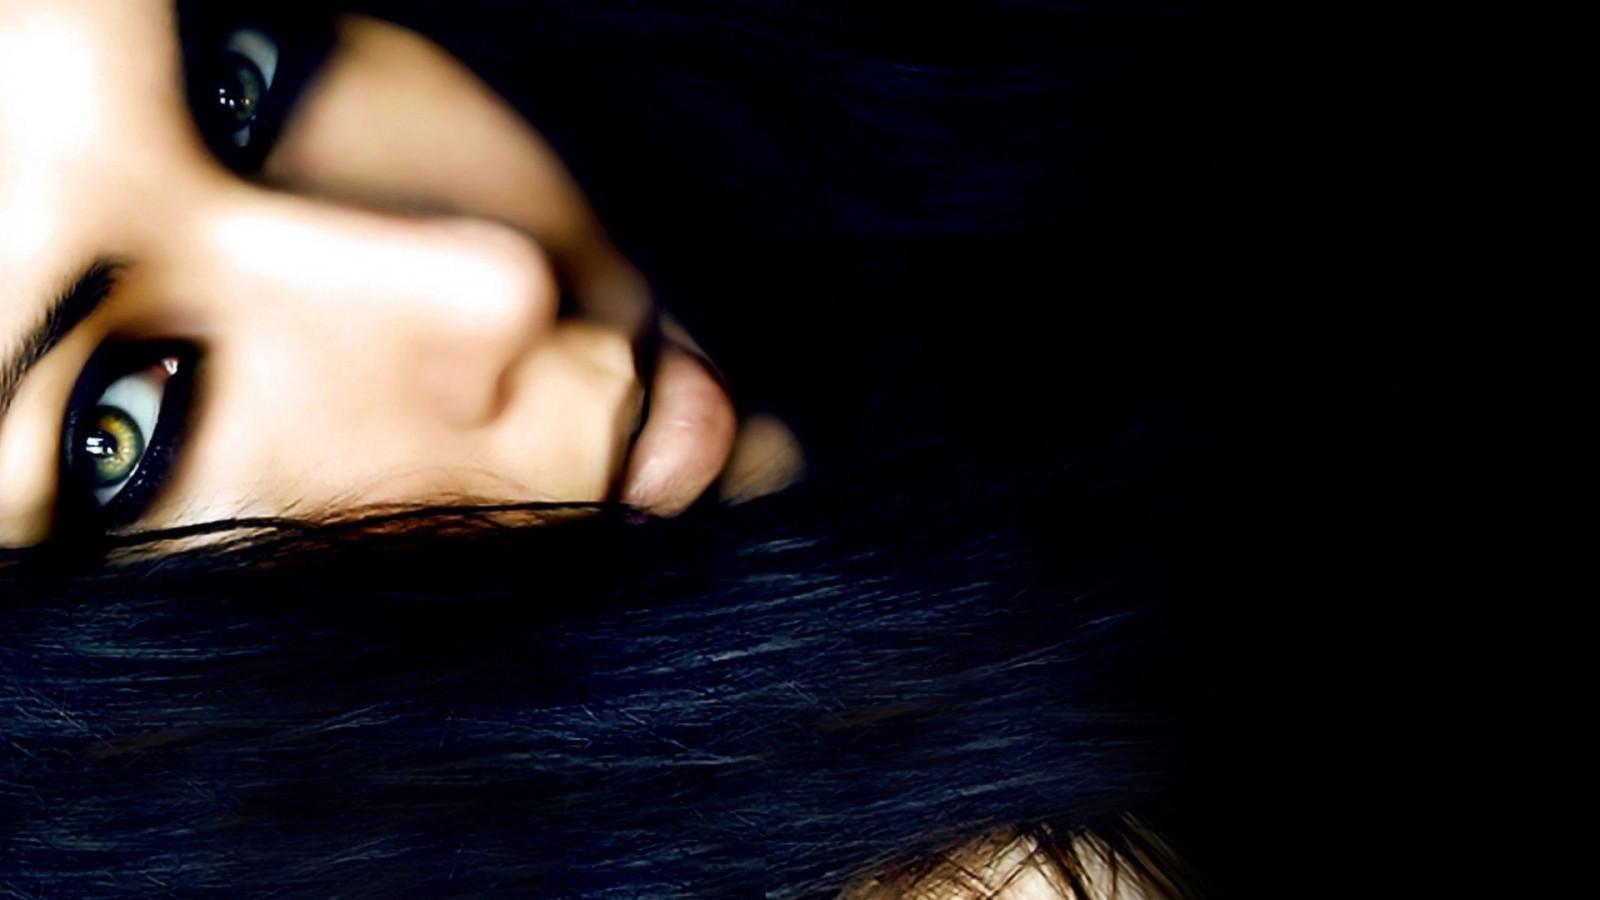 Фото красивых девушек брюнеток без лица на аву в вк